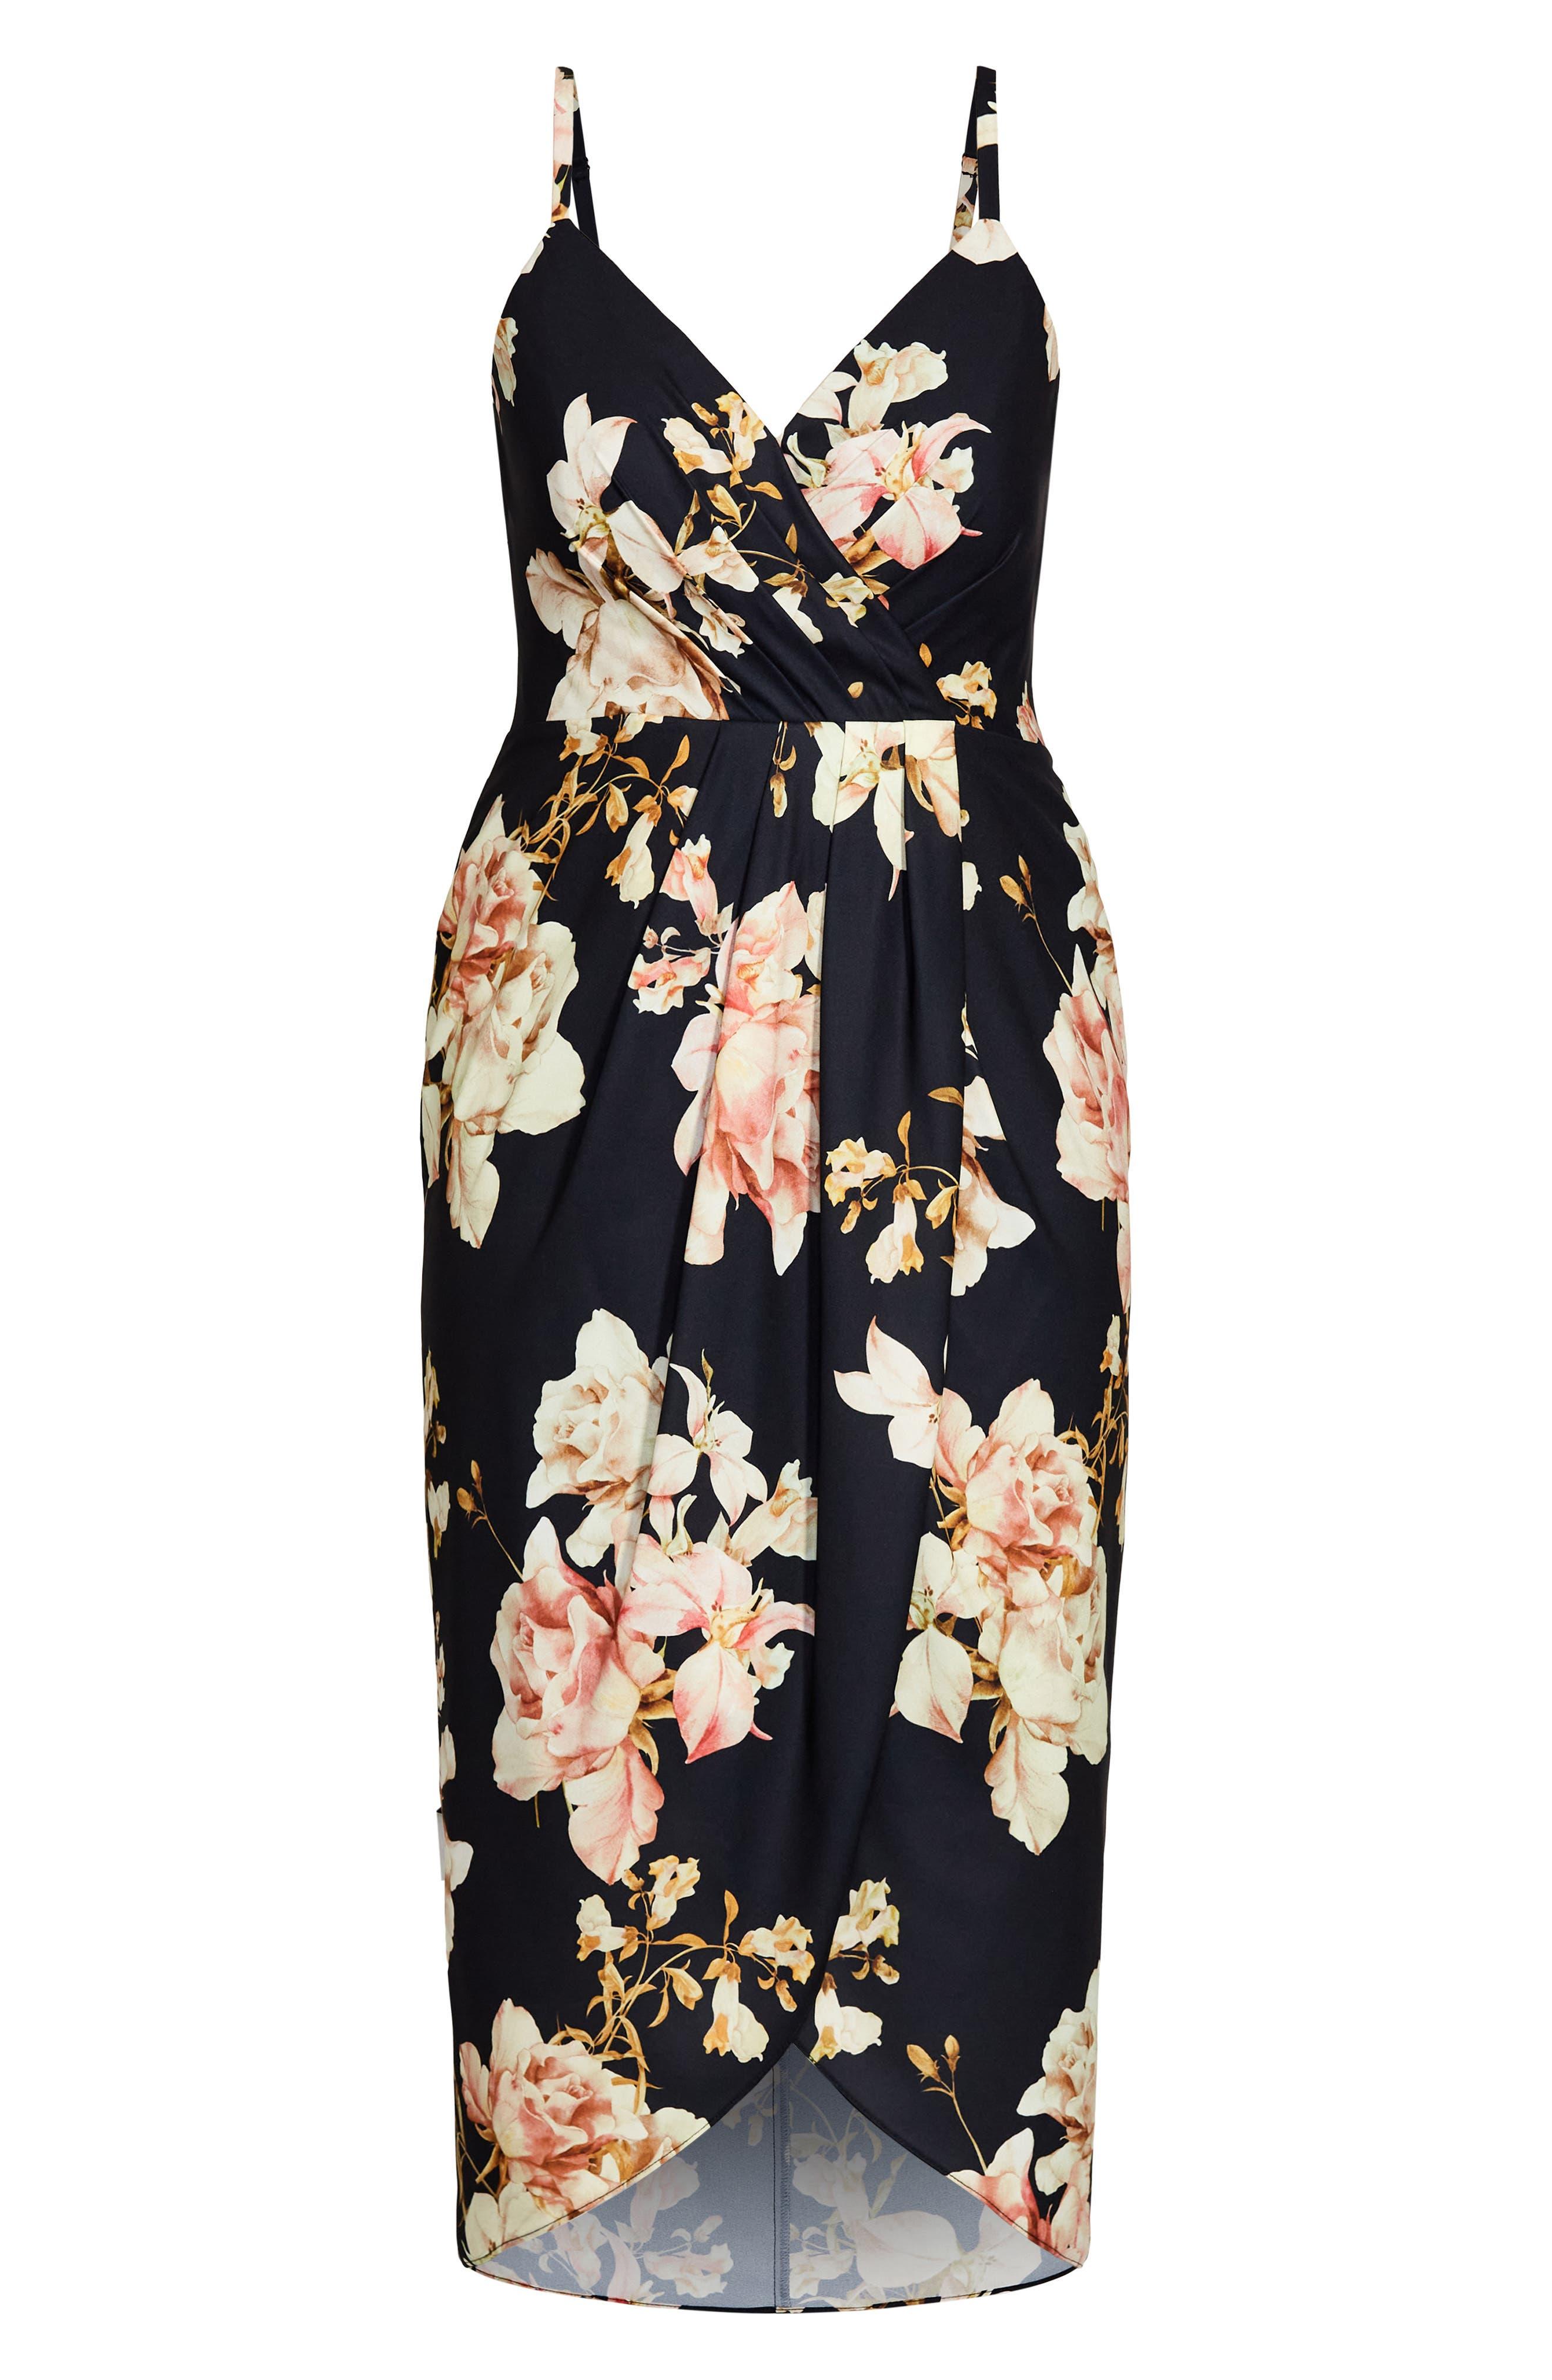 Floral Flourish Sheath Dress